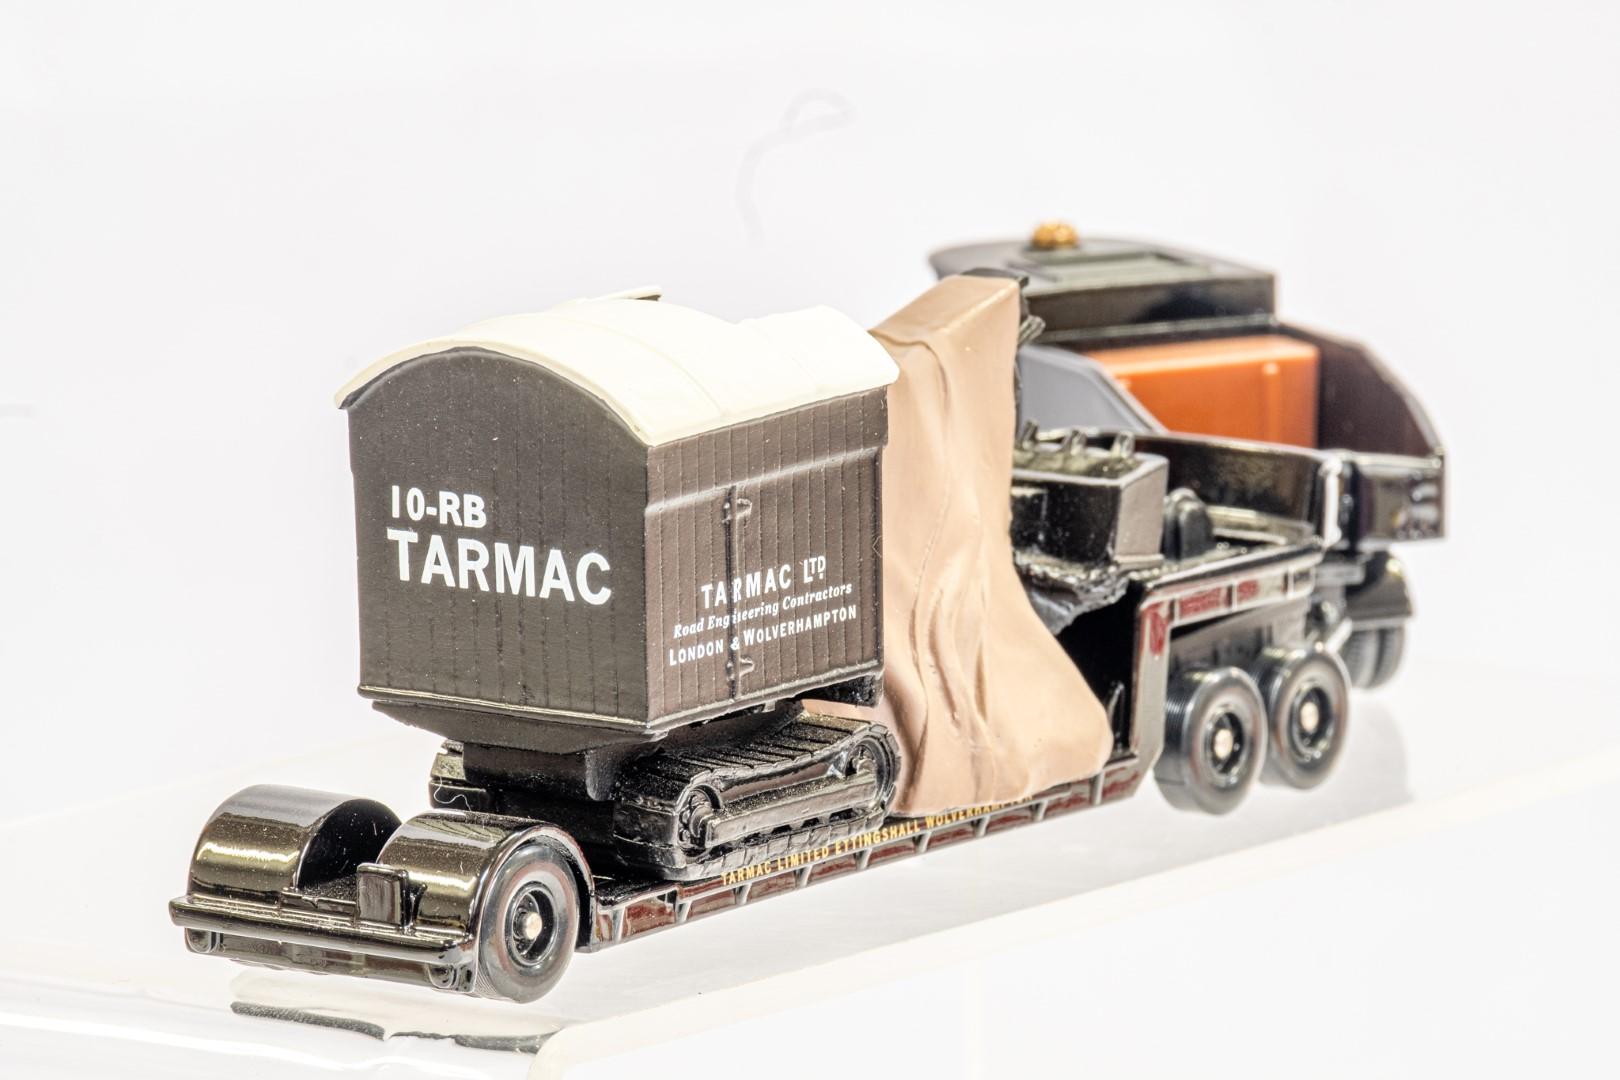 Corgi & Lledo 2 Boxed Models - Service Vans Of the 50's & 60's & Sentinel Ballast - Image 5 of 12